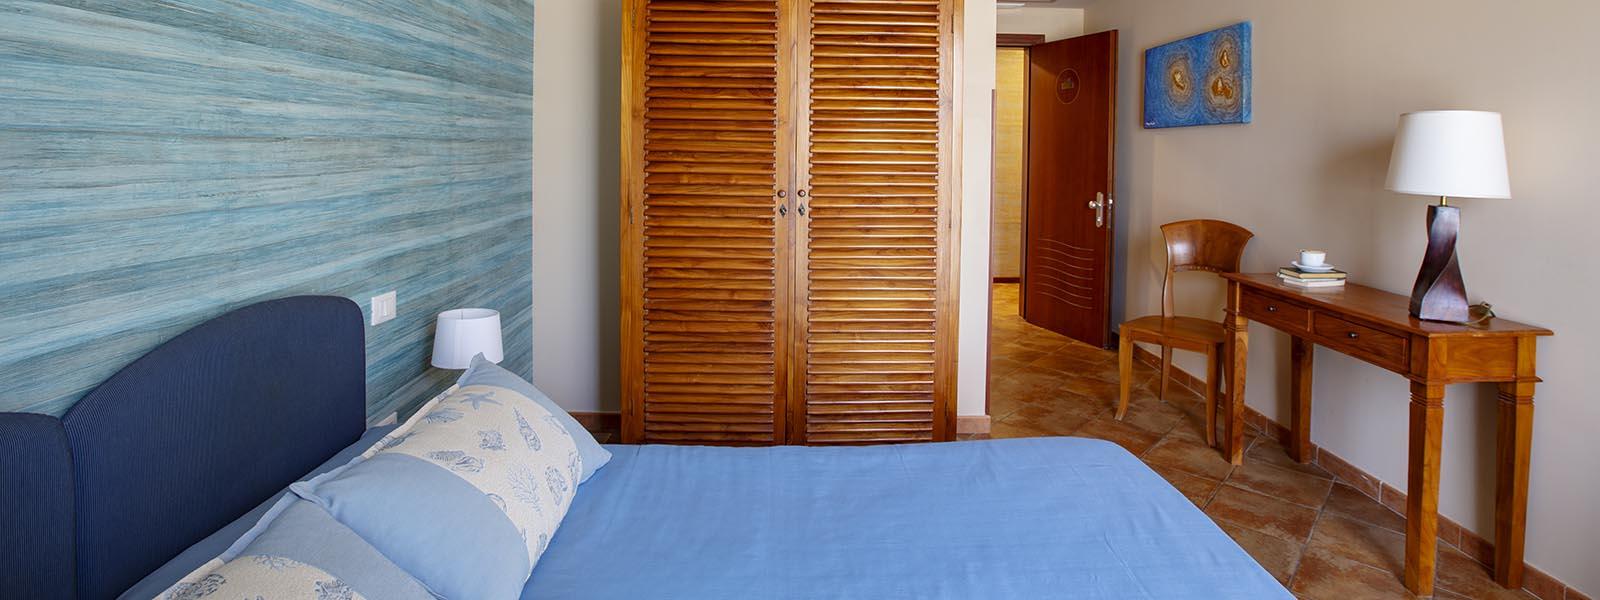 hotel-3-stelle-favignana-isole-egadi-camere-05